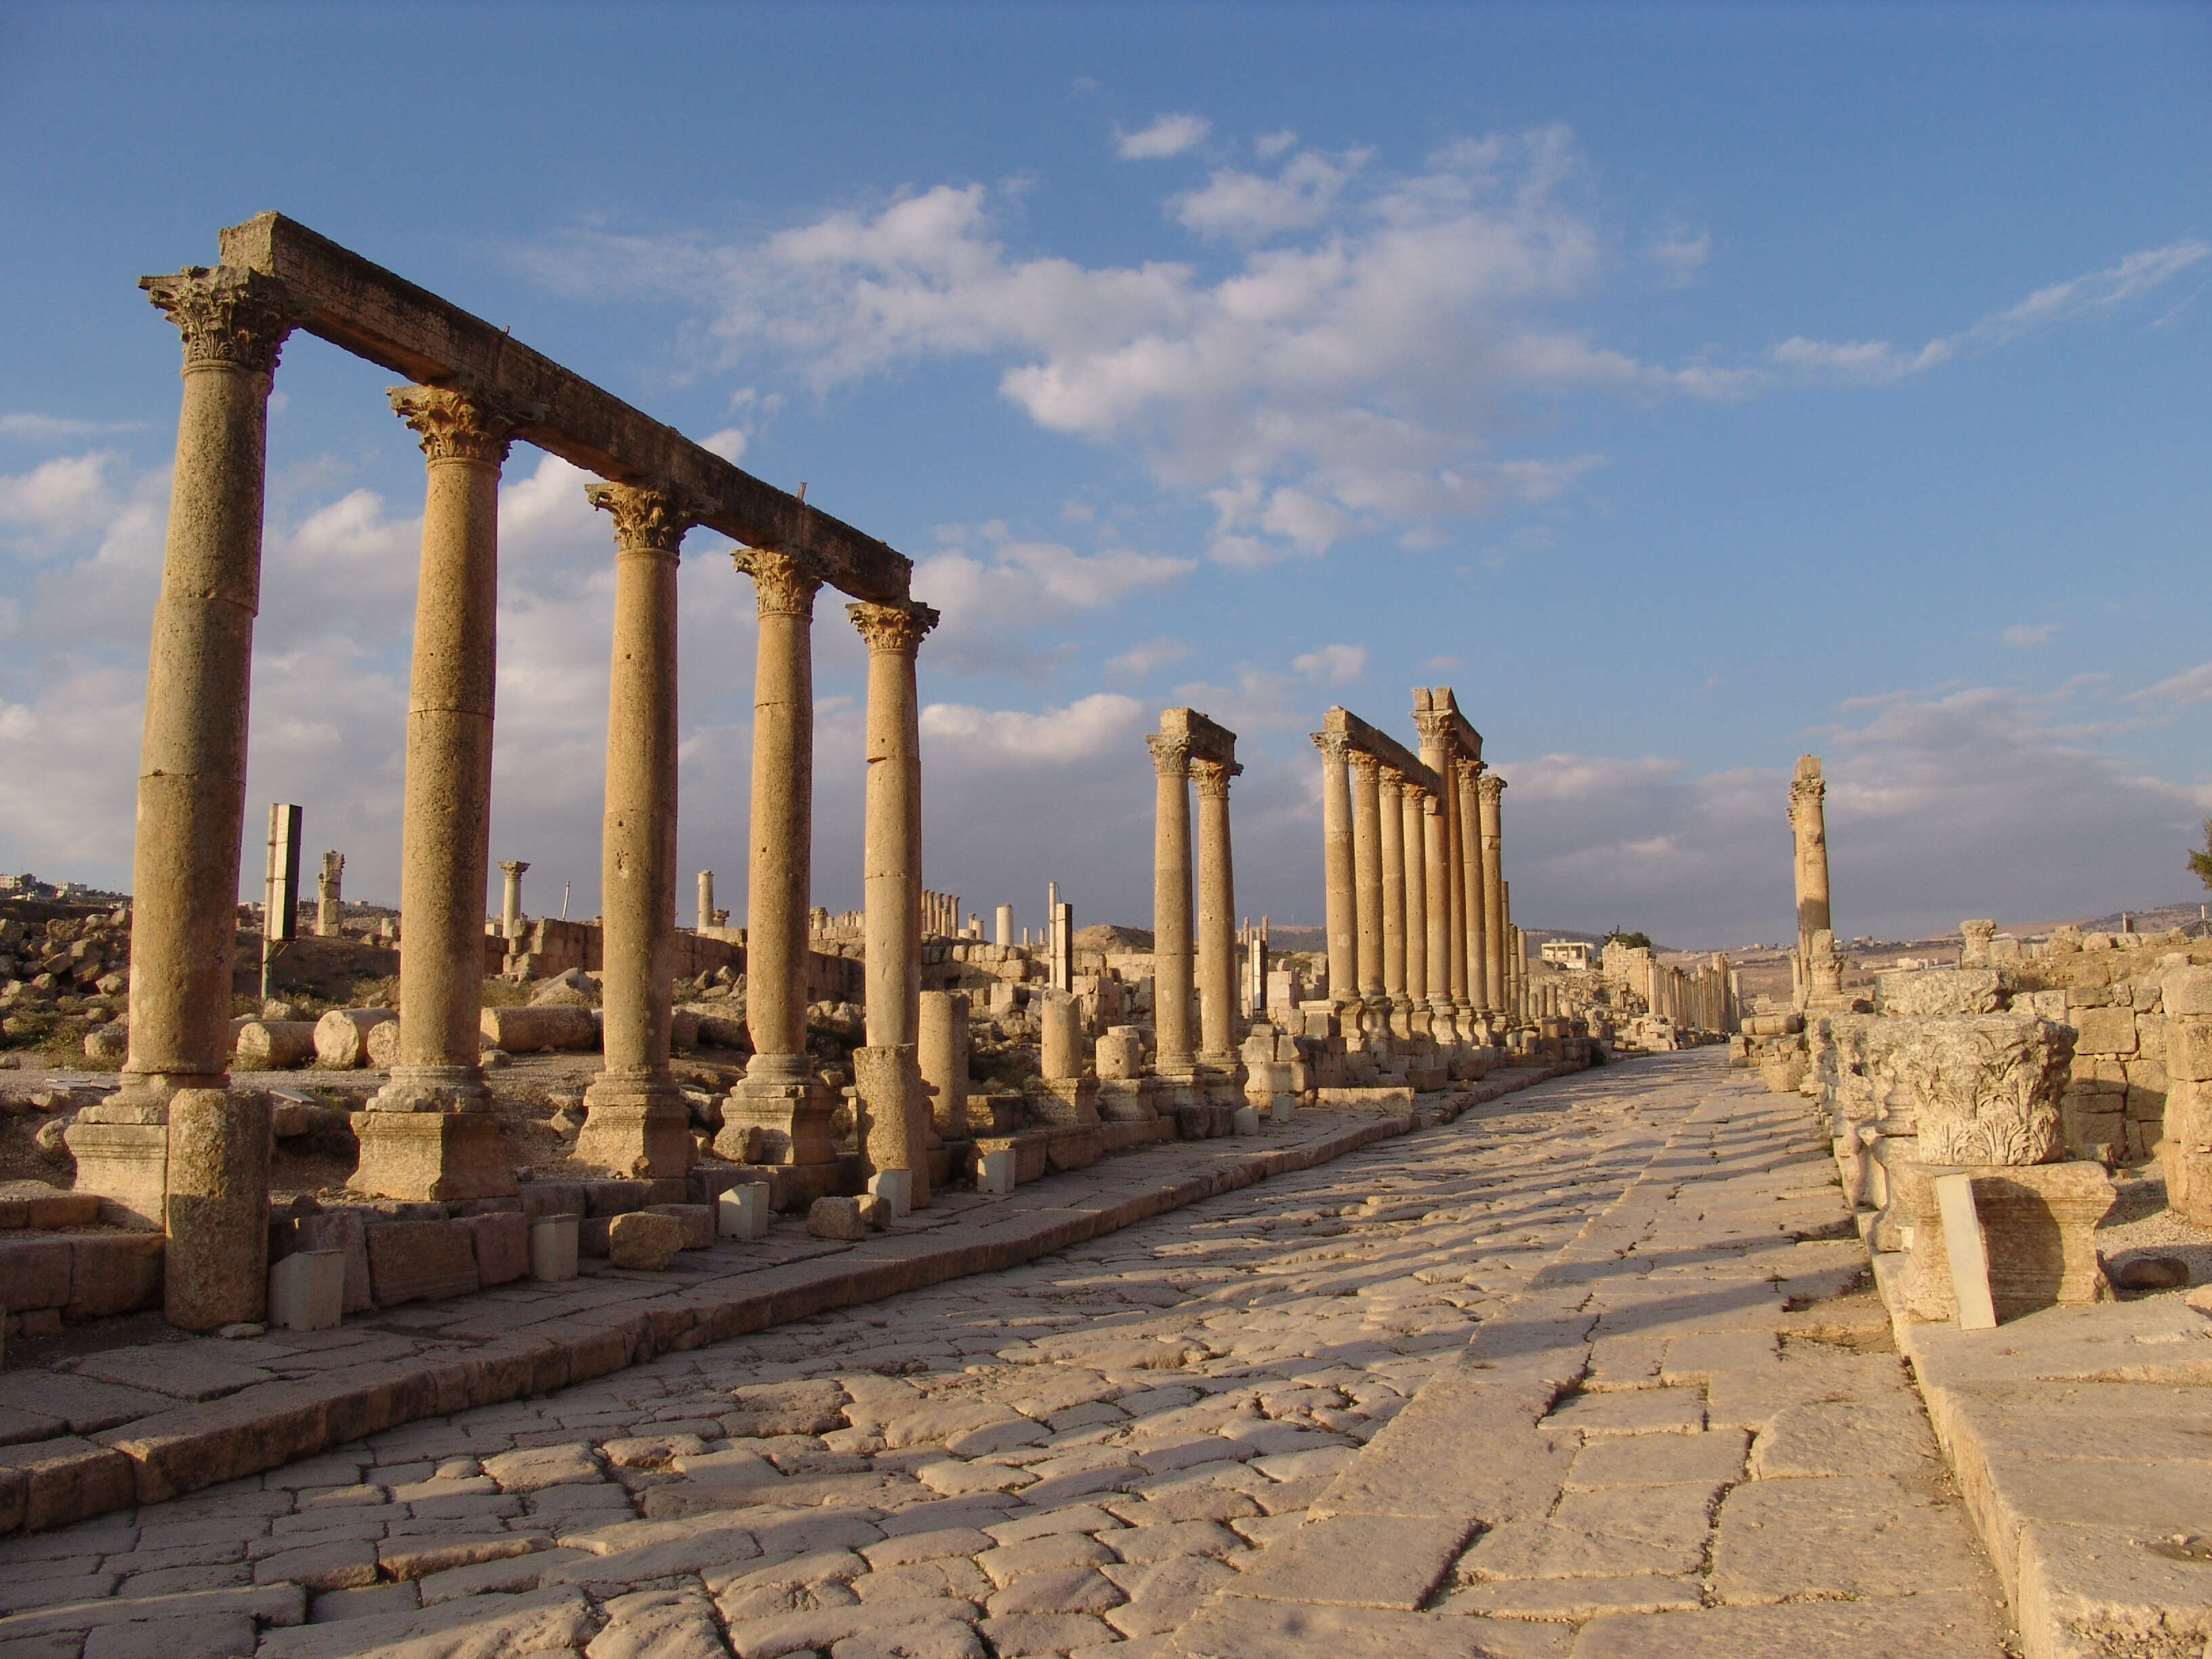 Tuesday, November 12 / Jerash - Gadara - Galilee